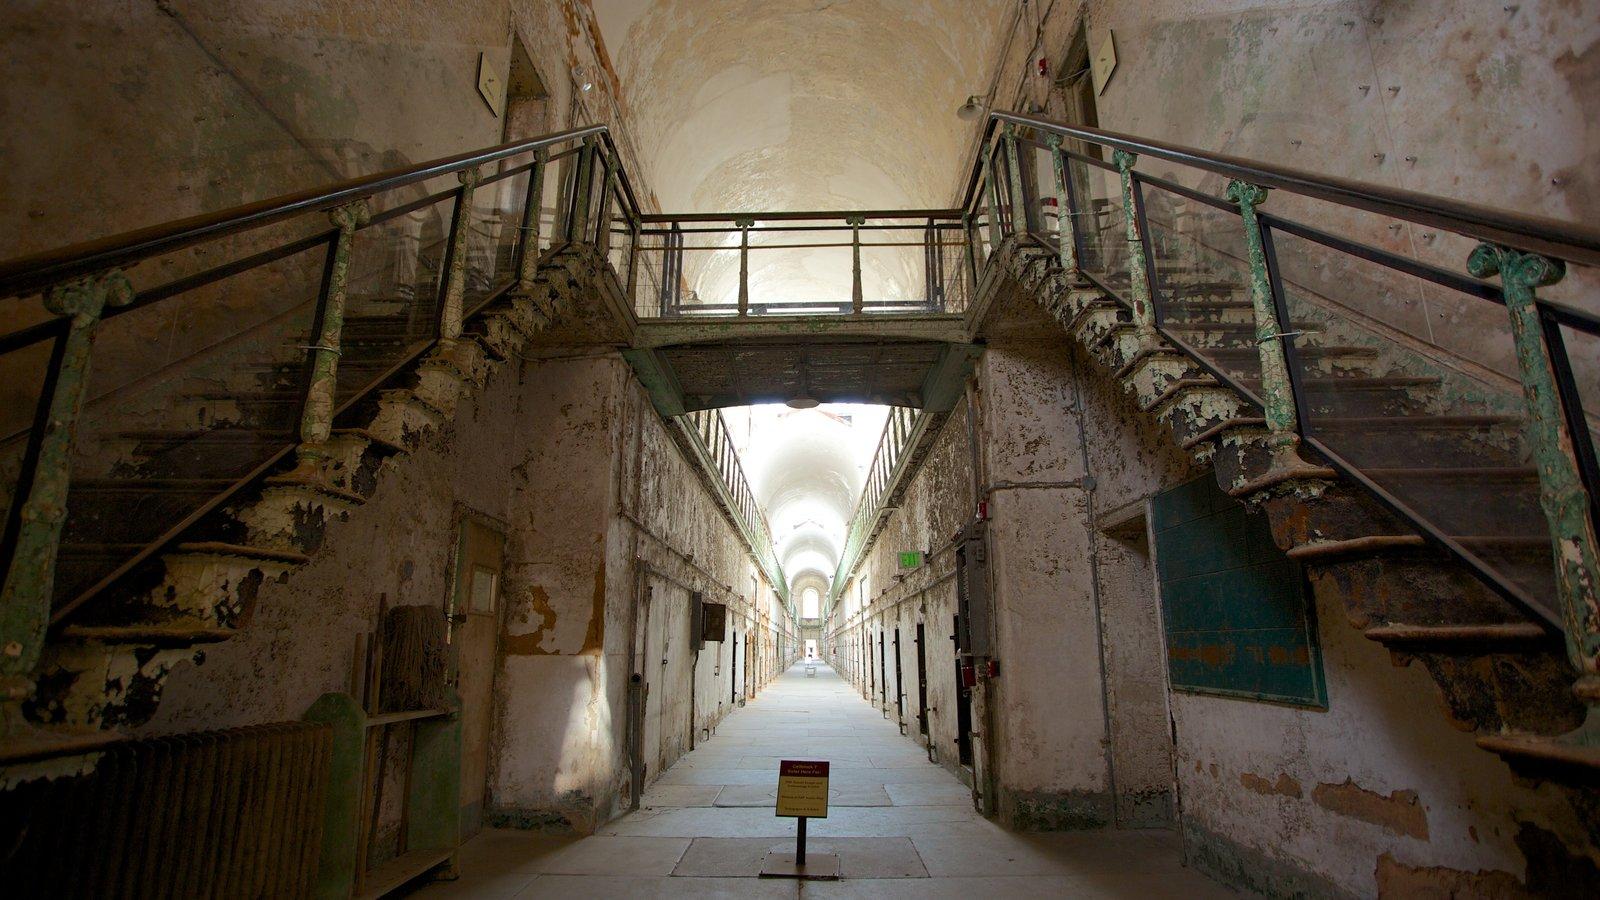 Eastern State Penitentiary mostrando vistas interiores